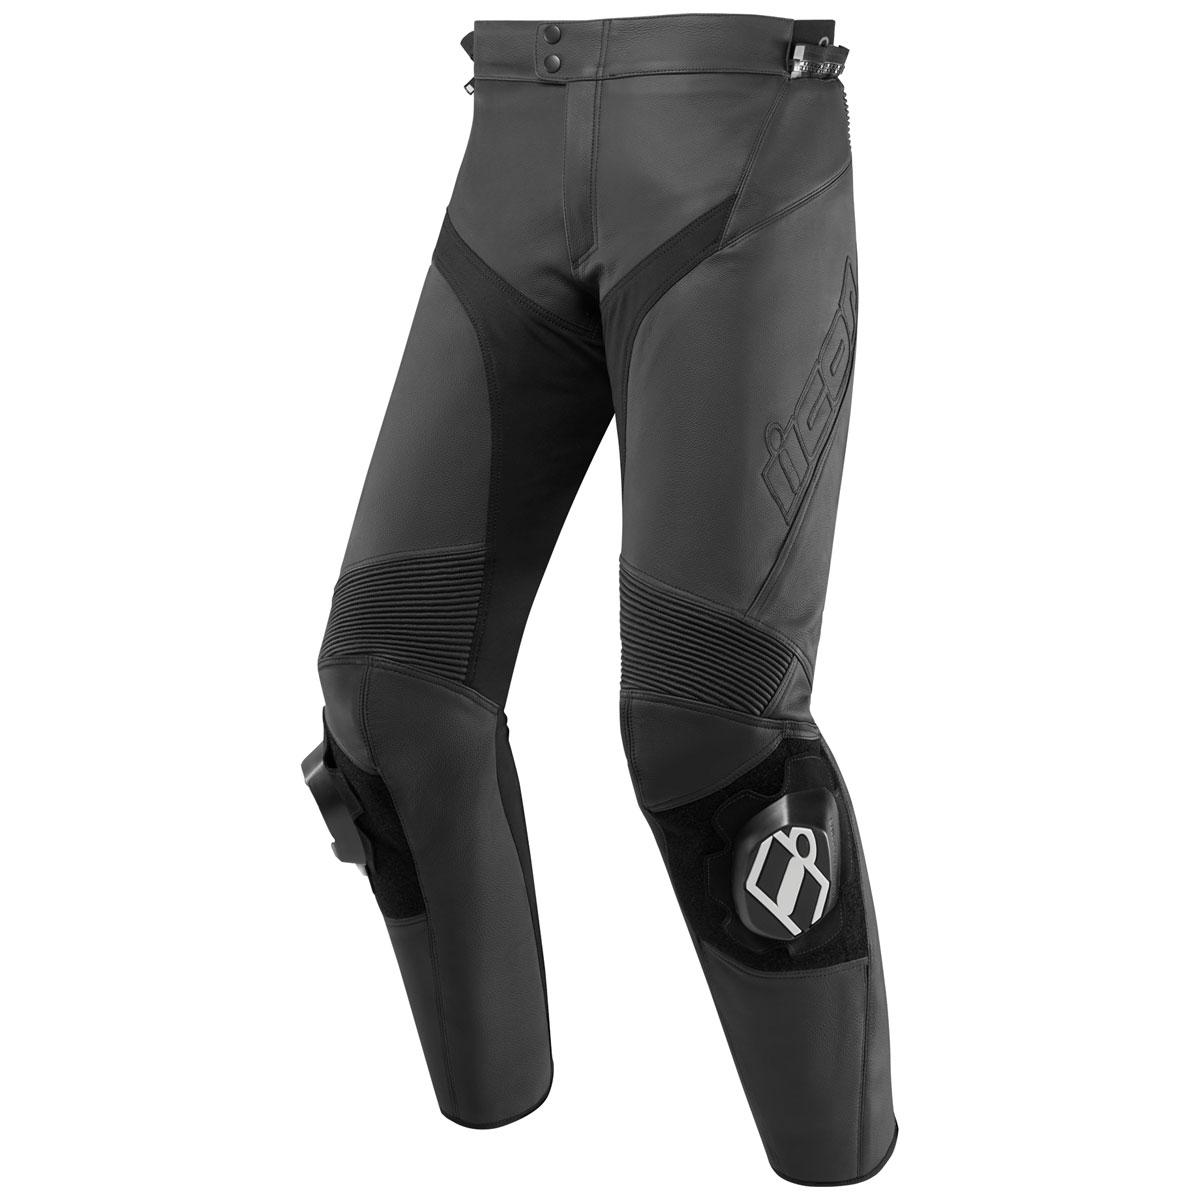 ICON Men's Hypersport 2 Black Leather Pants